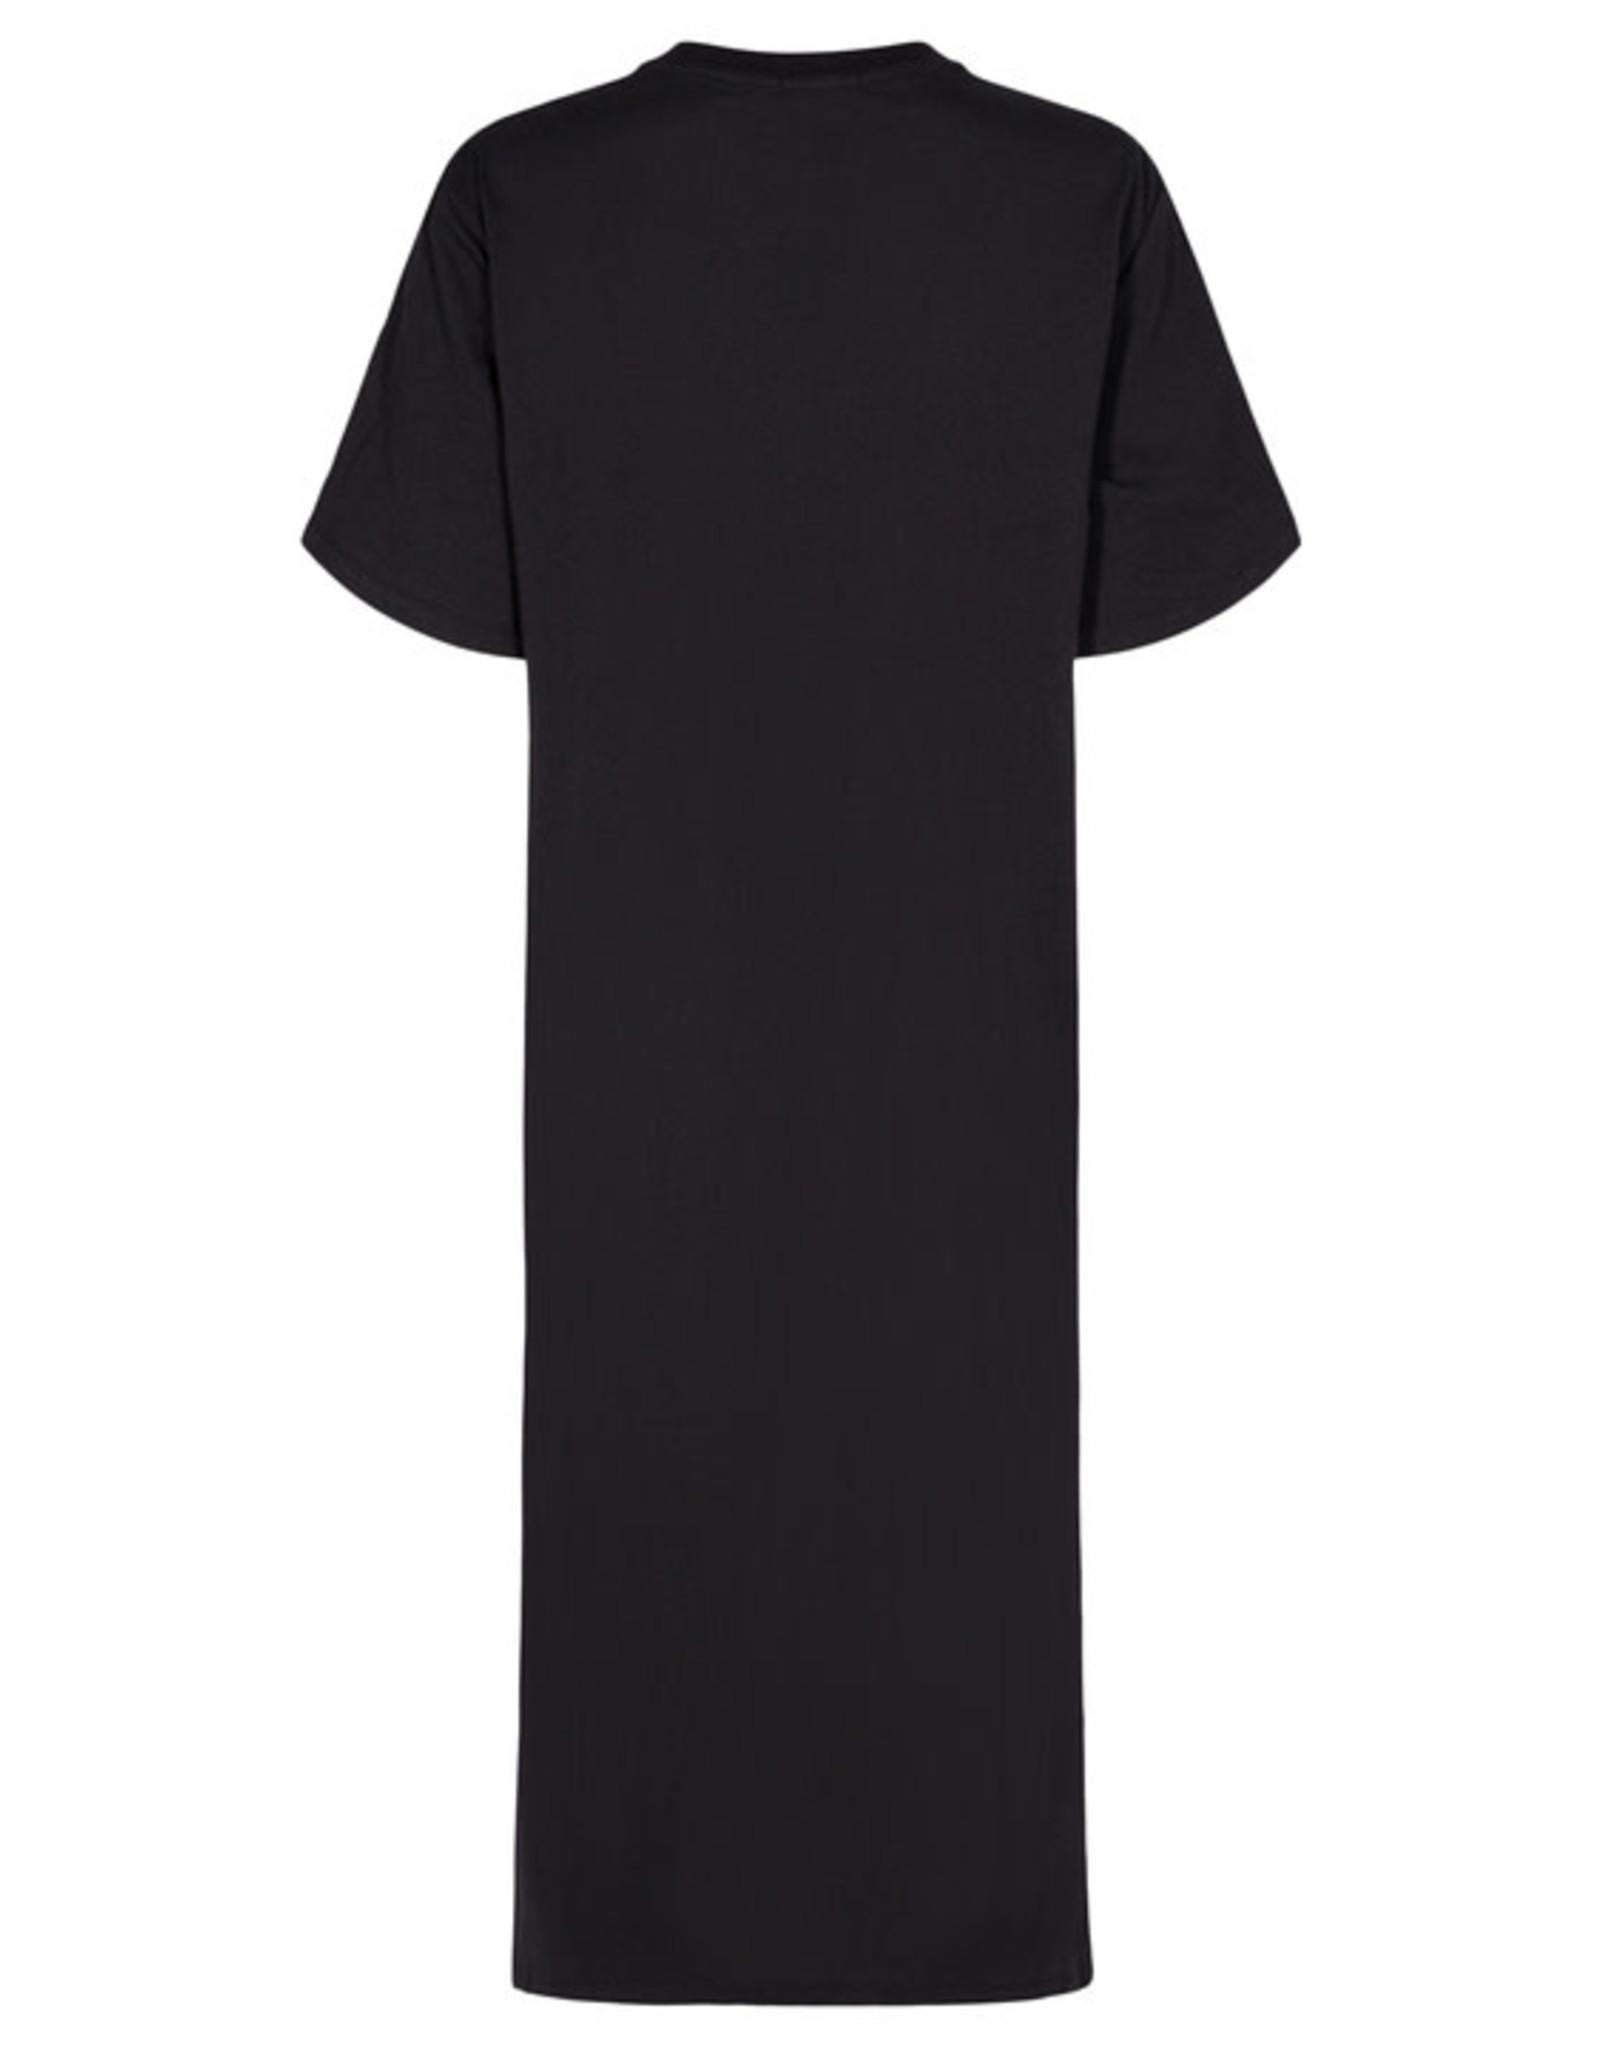 DRG SS21 17040 Stanley slit dress black